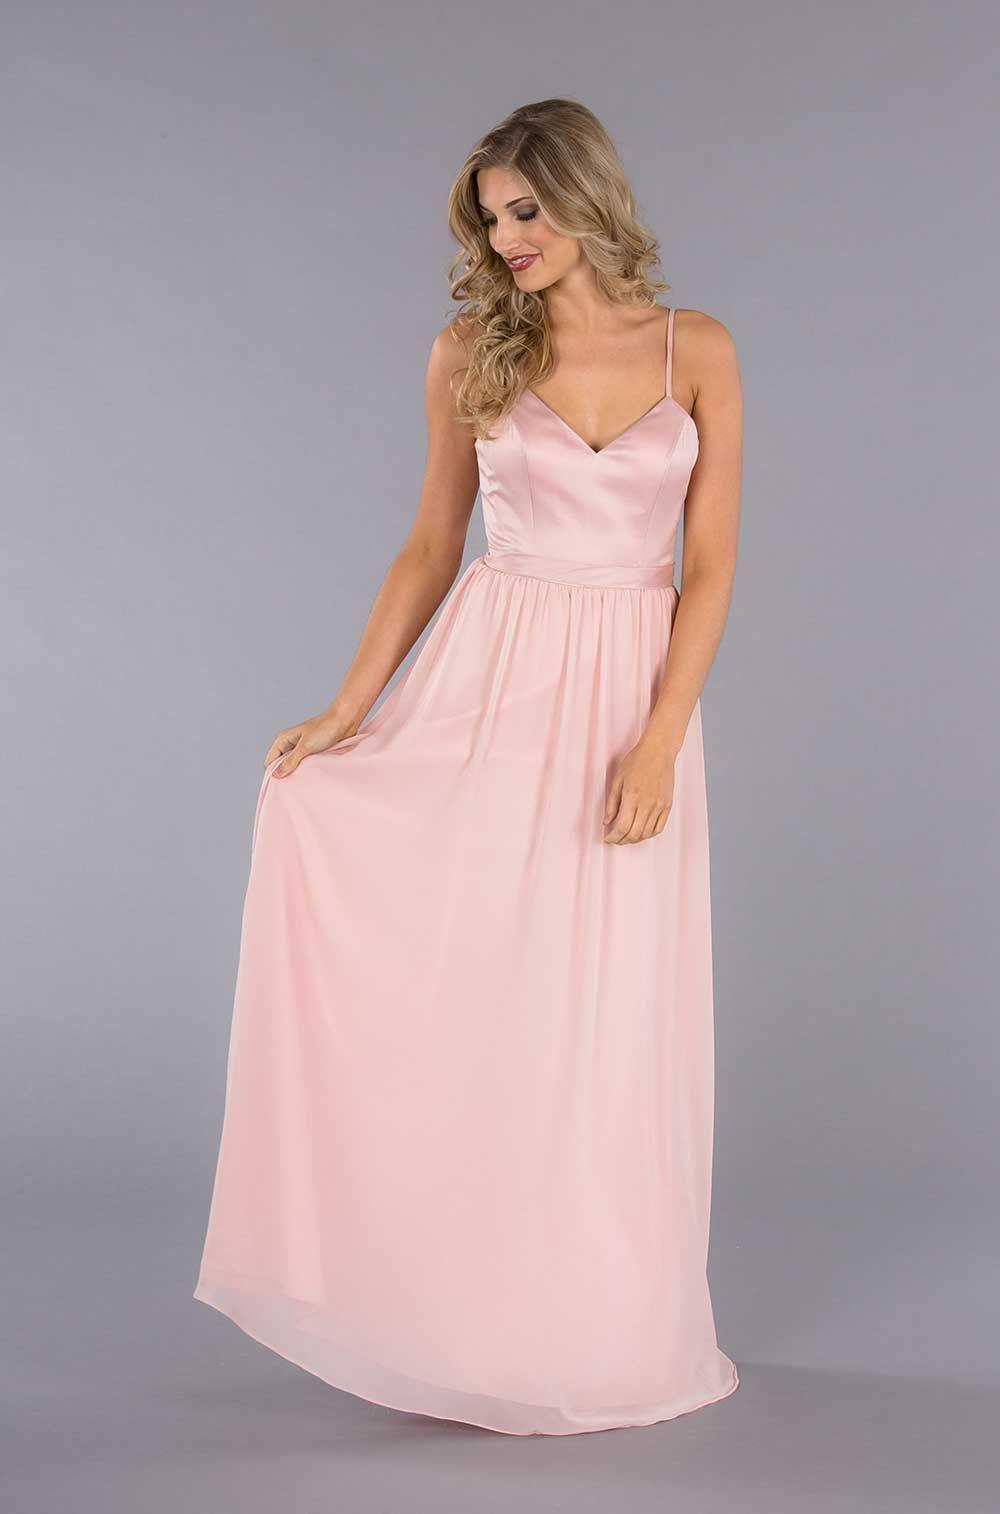 Abigail chiffon bridesmaid dresses dream wedding and wedding a satin top spaghetti strap bridesmaid dress with an elegant chiffon skirt ombrellifo Images